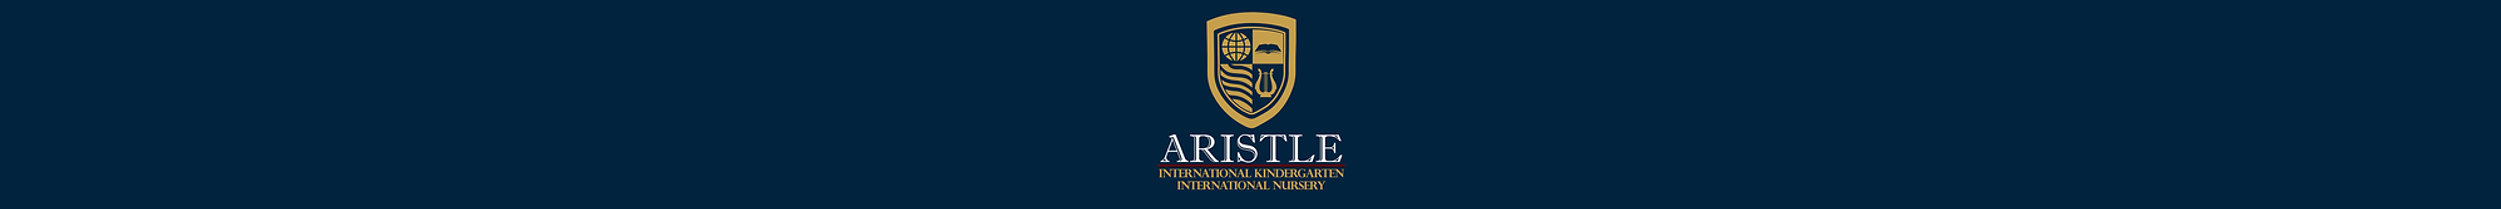 AIK-2019-Logo-1v3.jpg